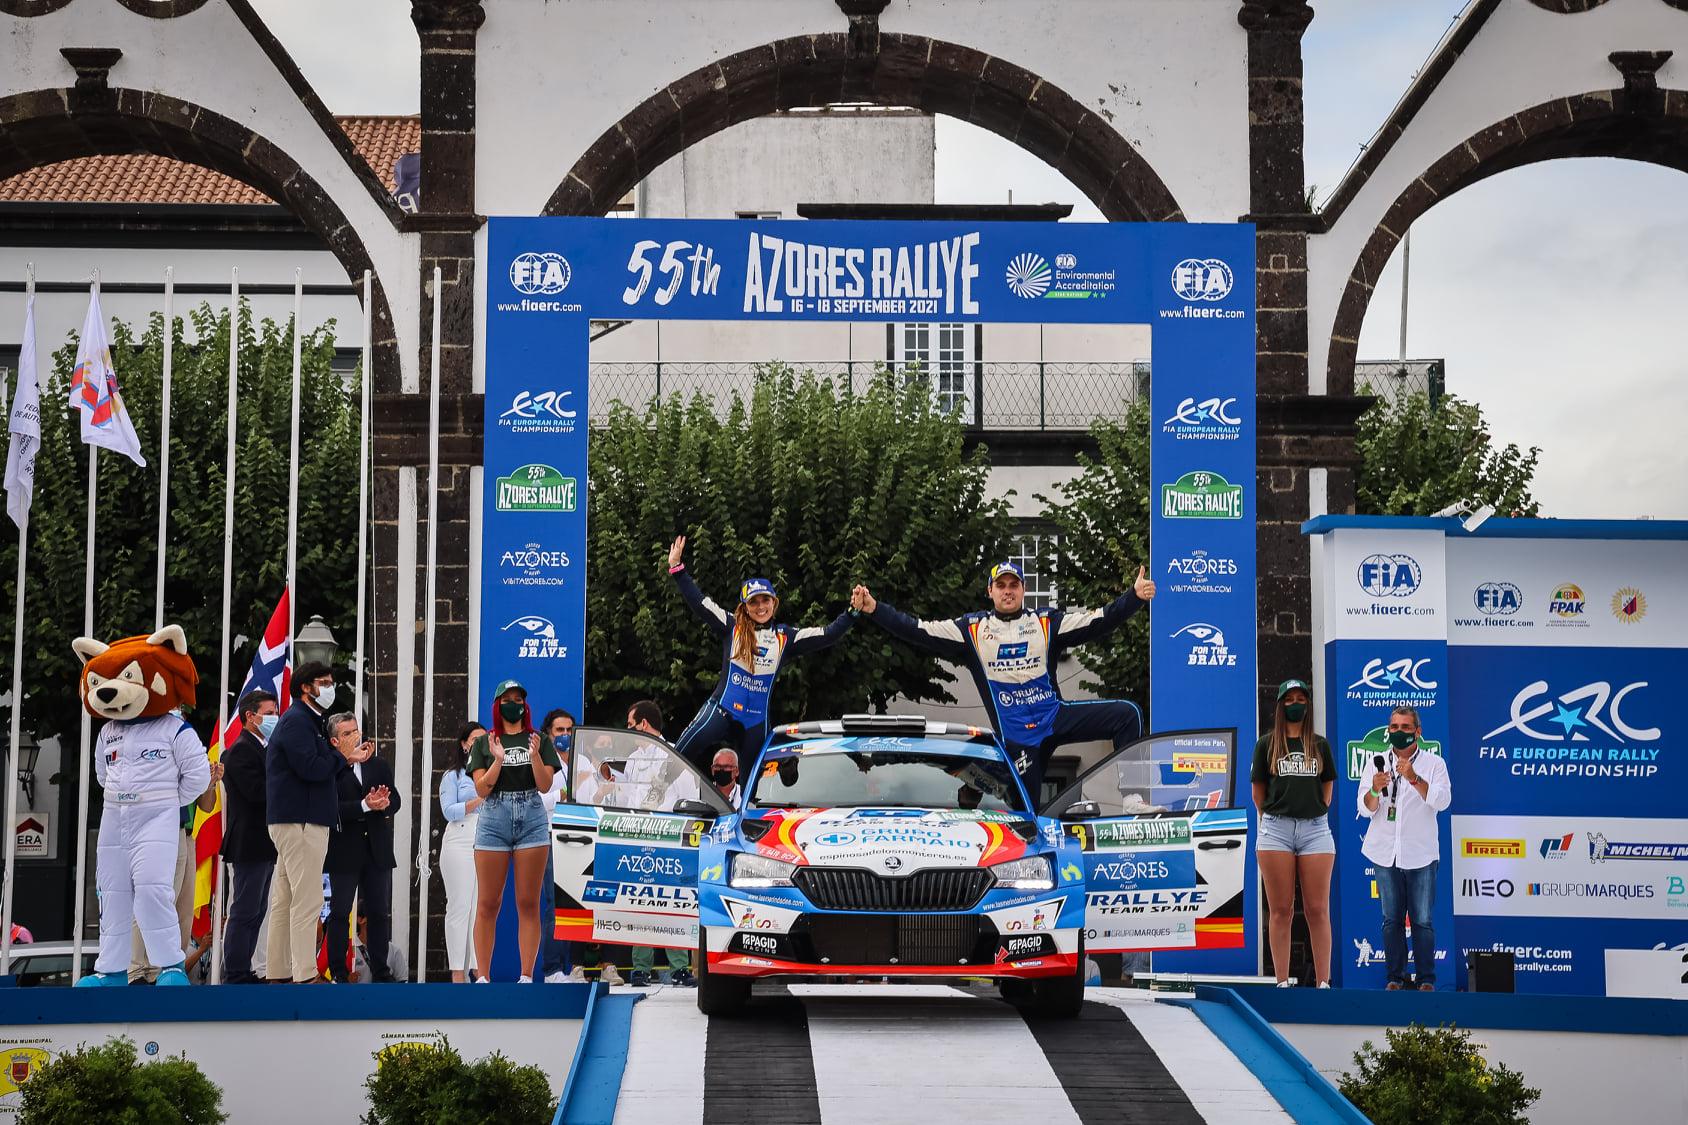 ERC: 55º Azores Rallye [16-18 Septiembre] - Página 2 E_pR-sgWYAI_f4u?format=jpg&name=large